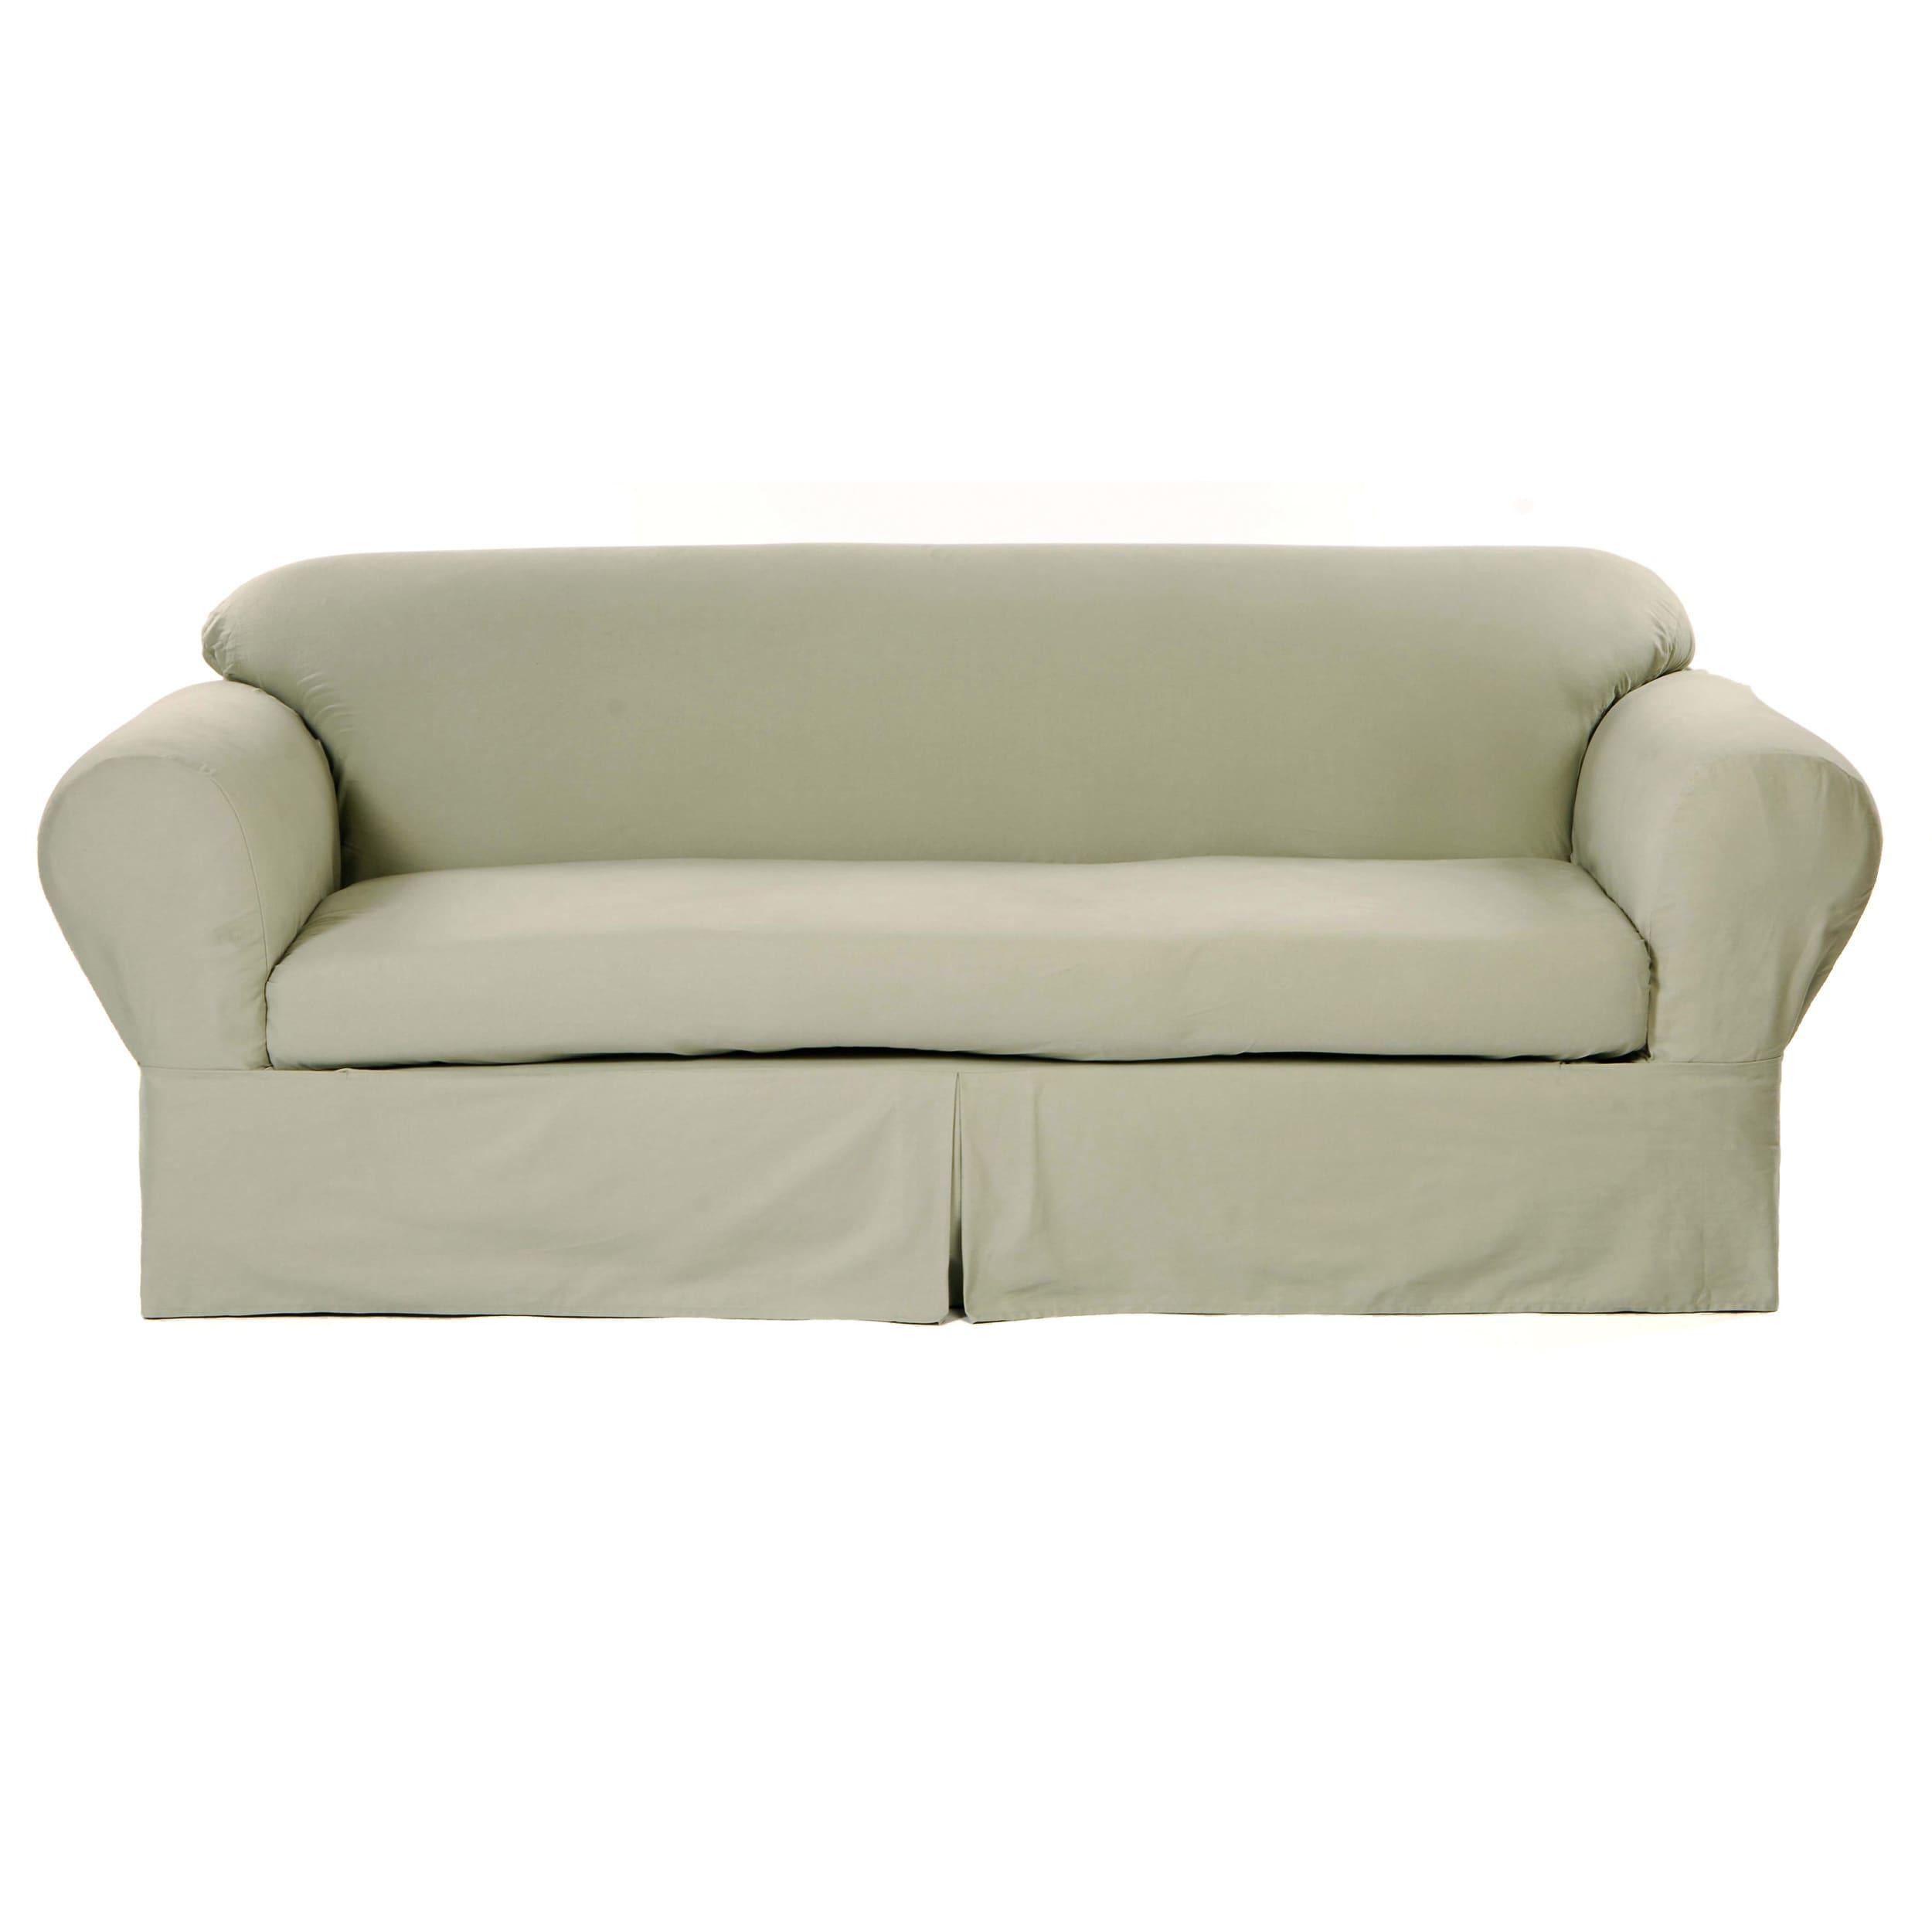 Merveilleux Classic 2 Piece Twill Sofa Slipcover